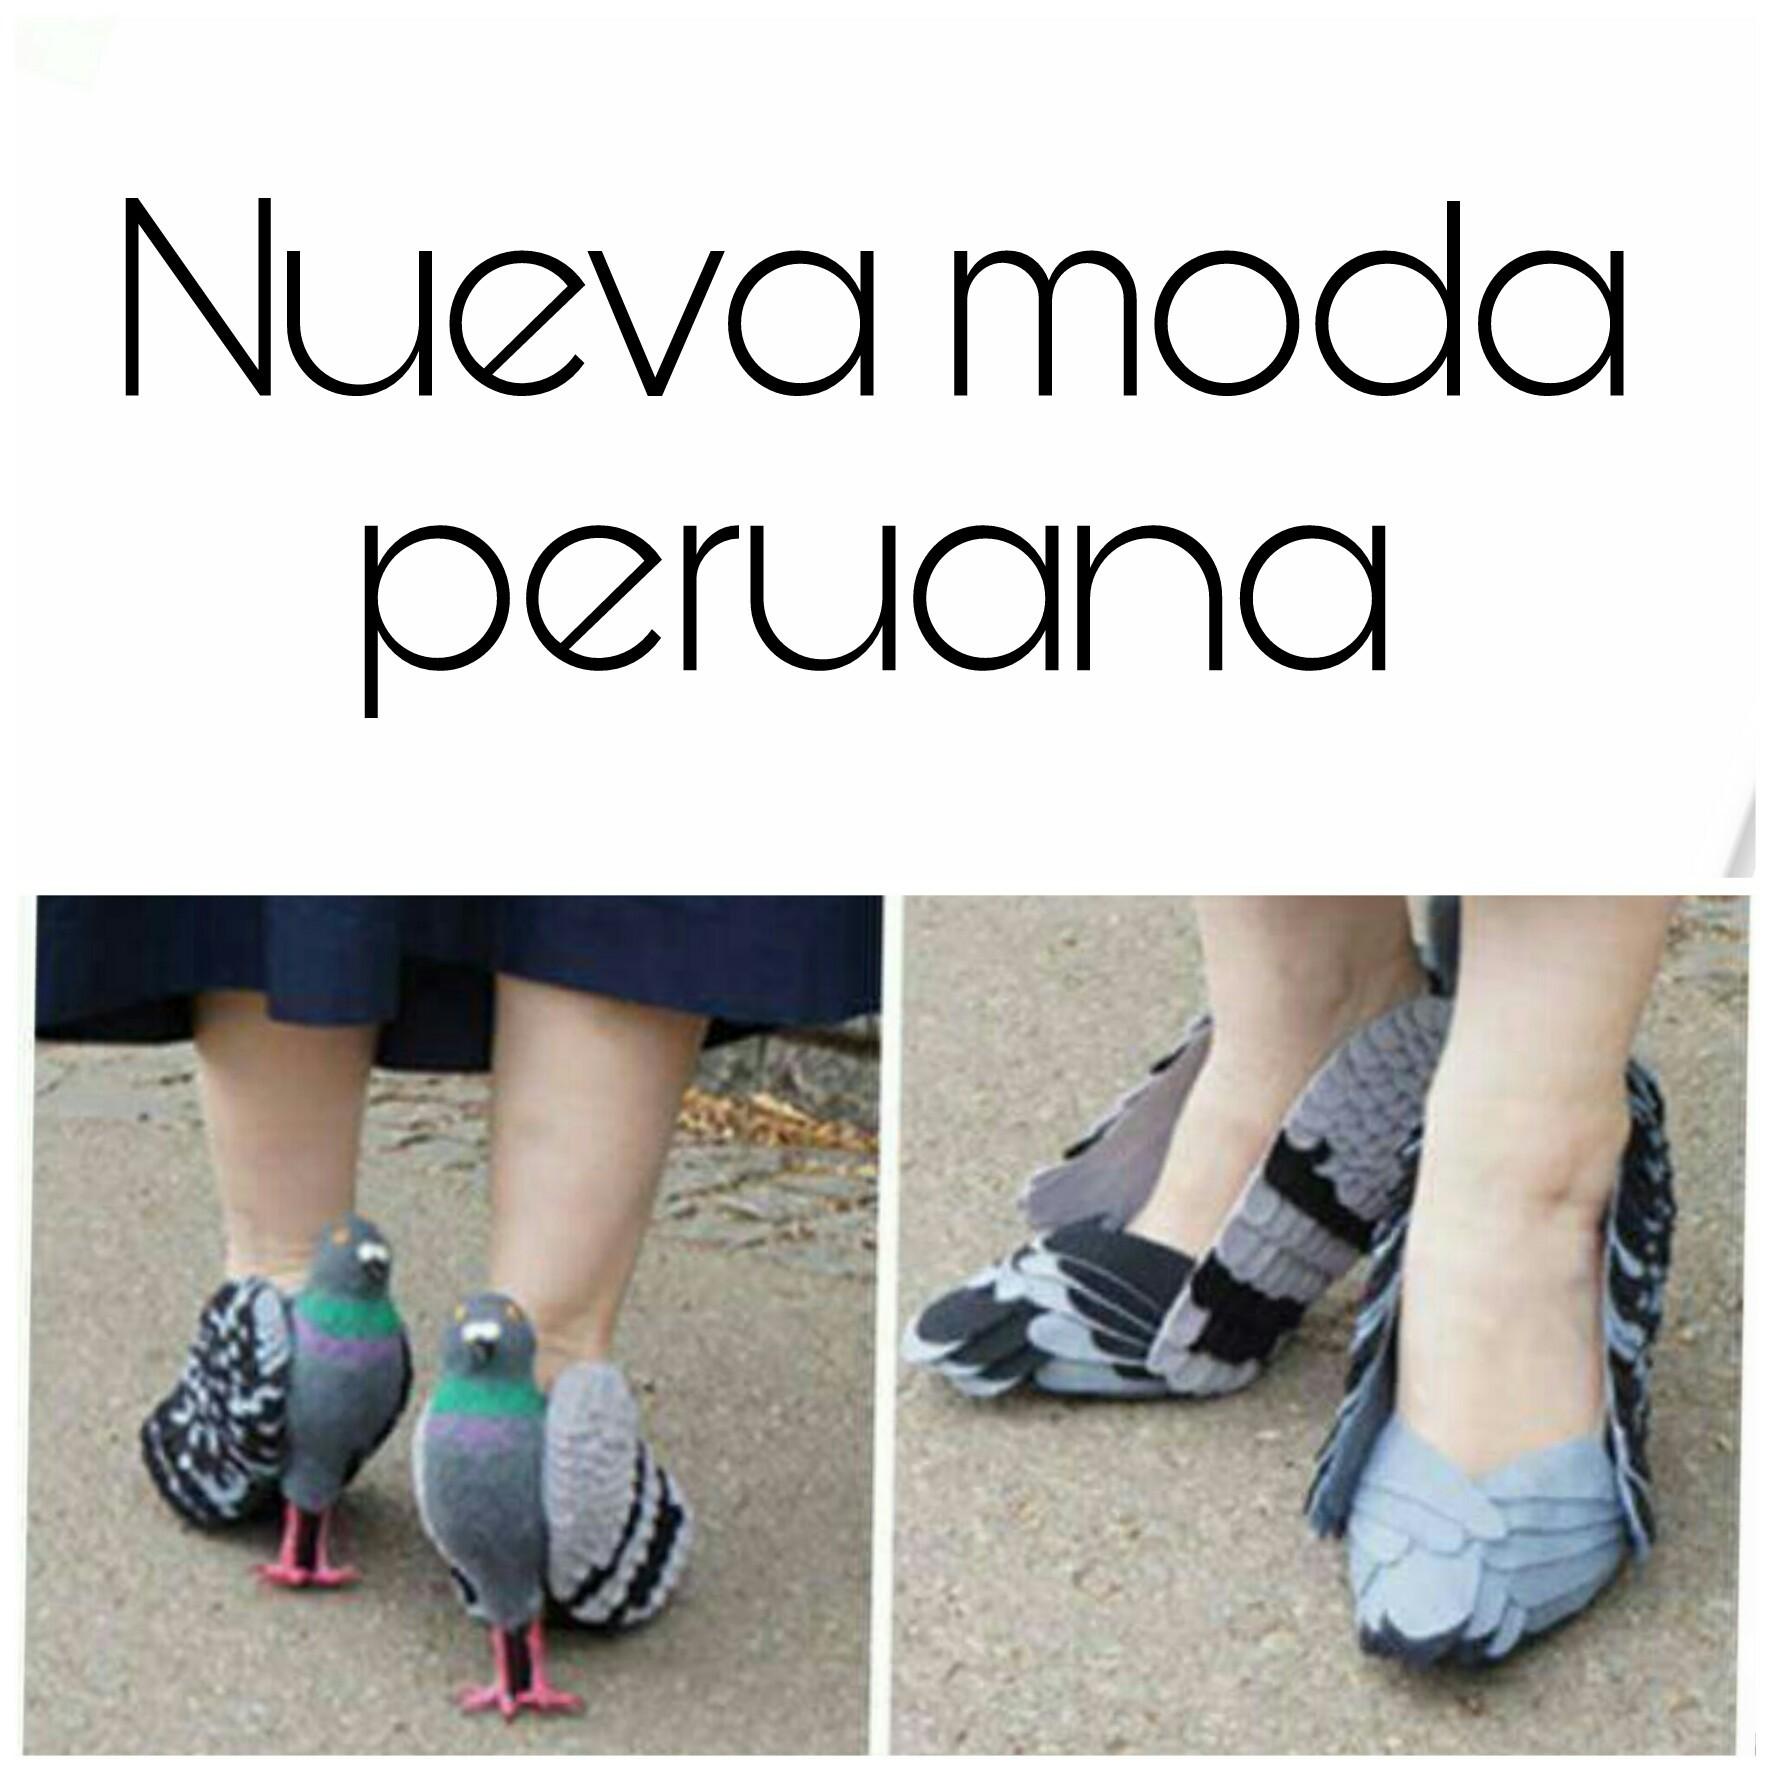 Estos Peruanos - meme